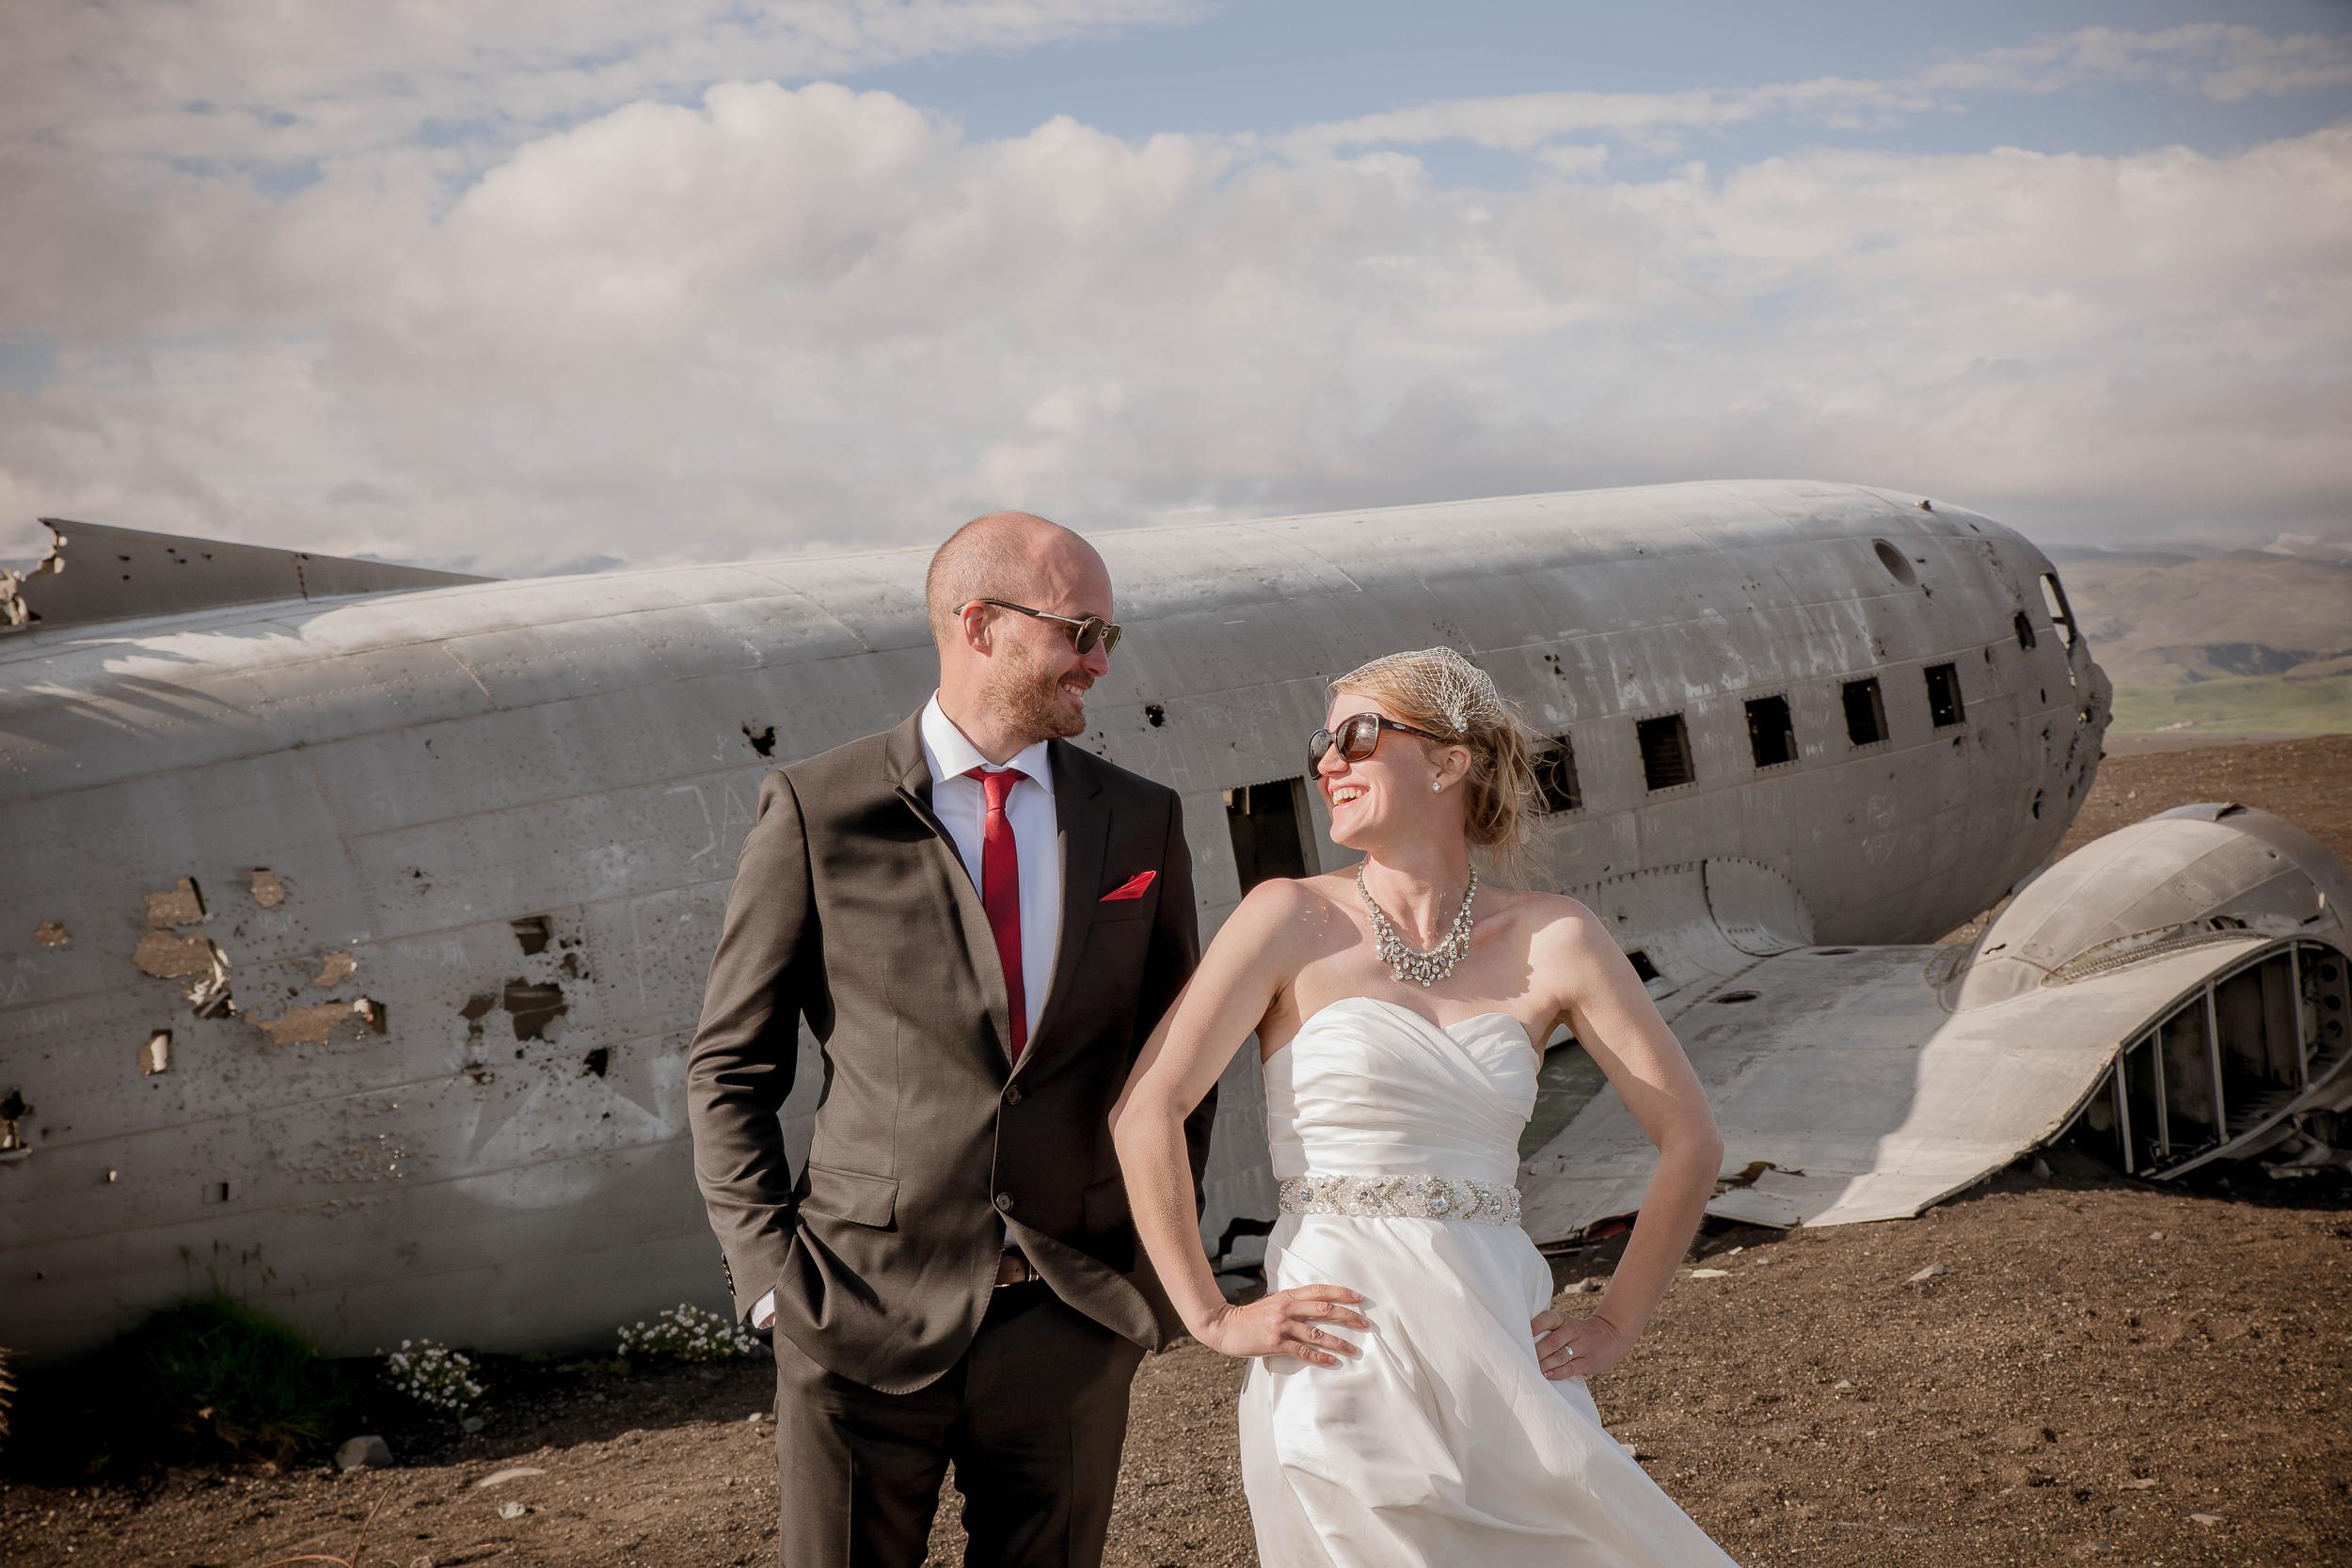 Iceland Crashed Airplane Wedding Photos by Miss Ann-9.jpg